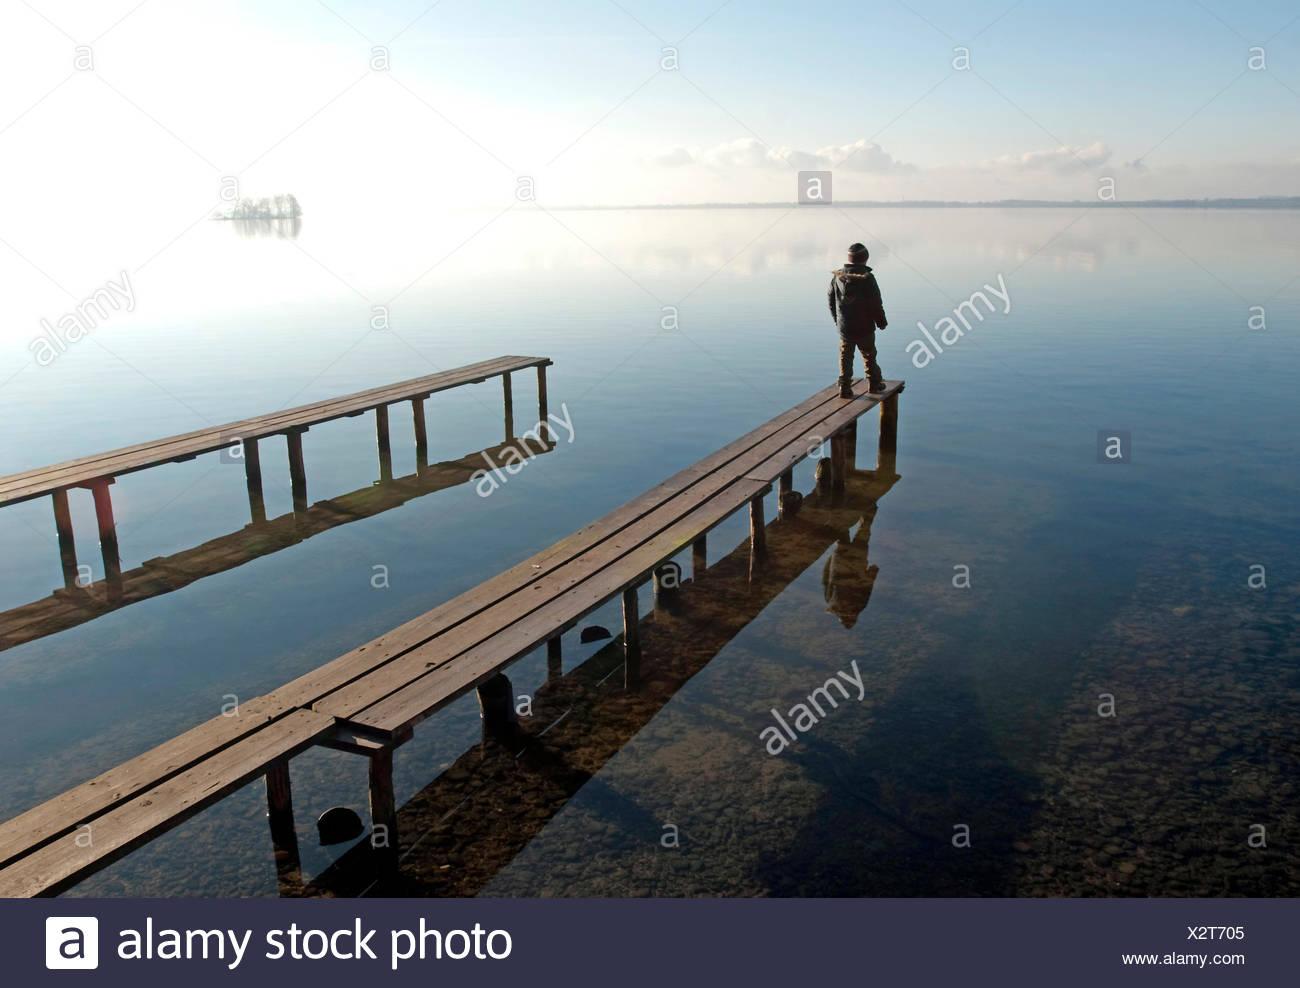 solitude,loneliness,lake,silence,alone Stock Photo